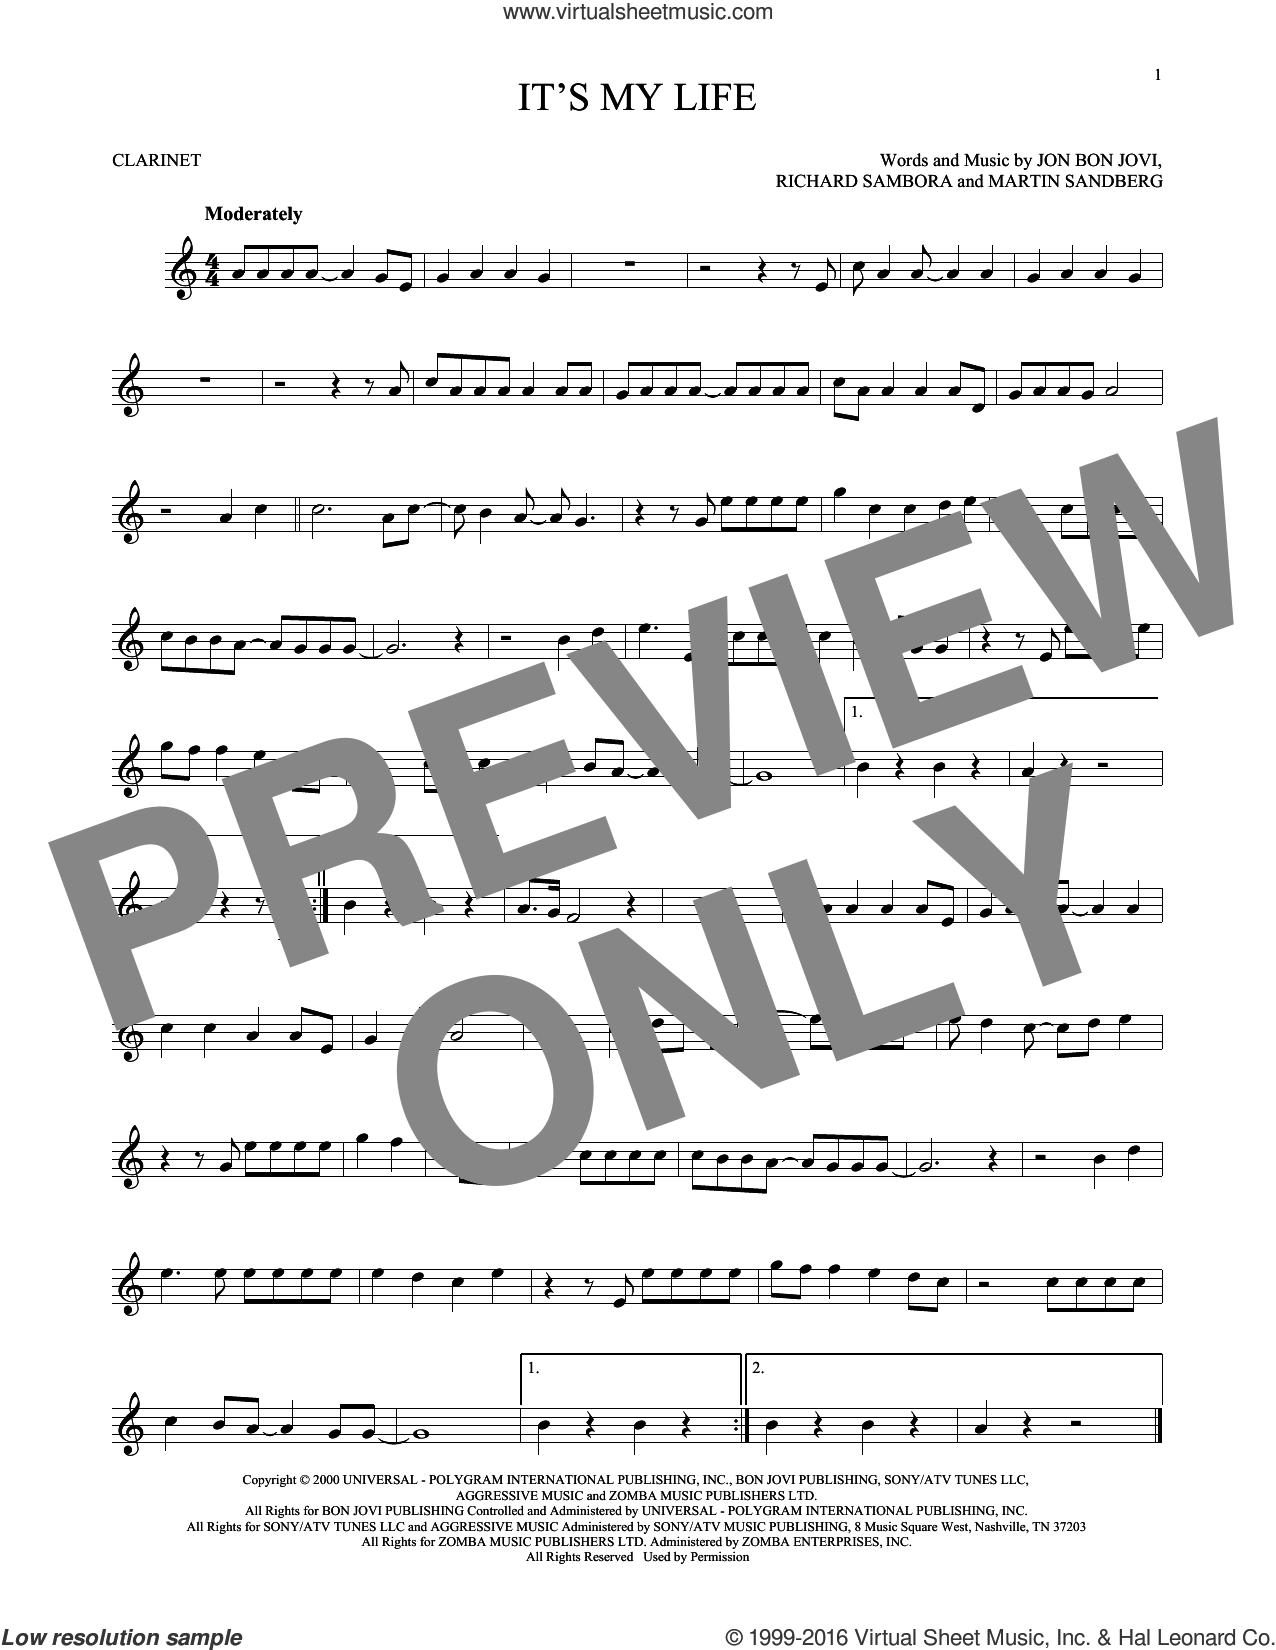 It's My Life sheet music for clarinet solo by Bon Jovi, Martin Sandberg and Richie Sambora, intermediate skill level